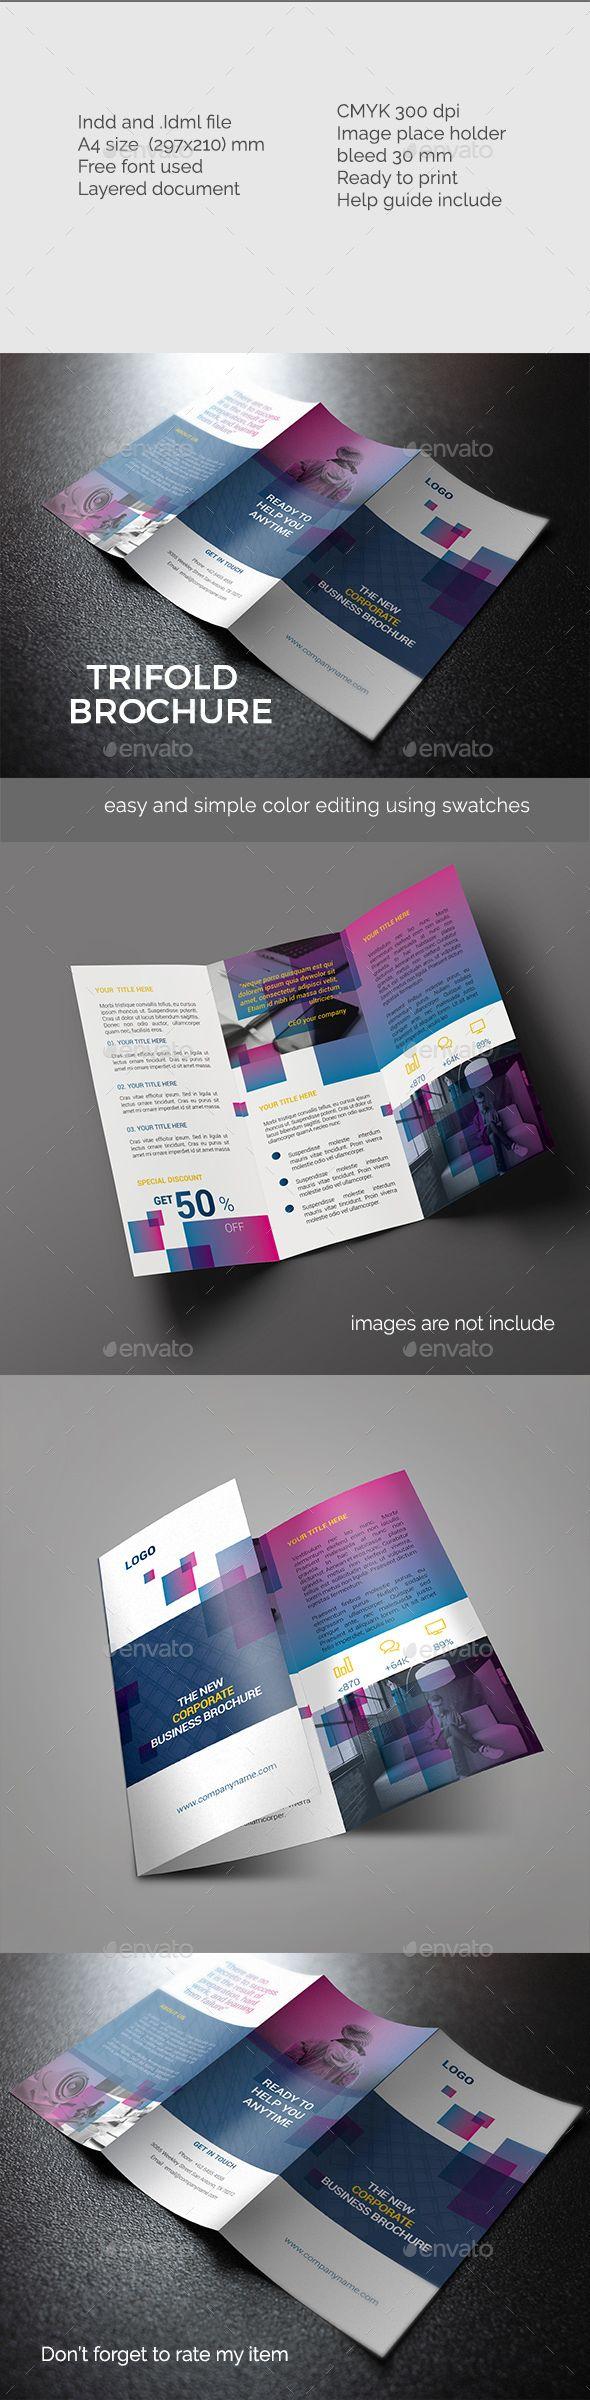 Elegant Trifold Brochure Template InDesign INDD. Download here: http://graphicriver.net/item/elegant-trifold-brochure-/15305148?ref=ksioks